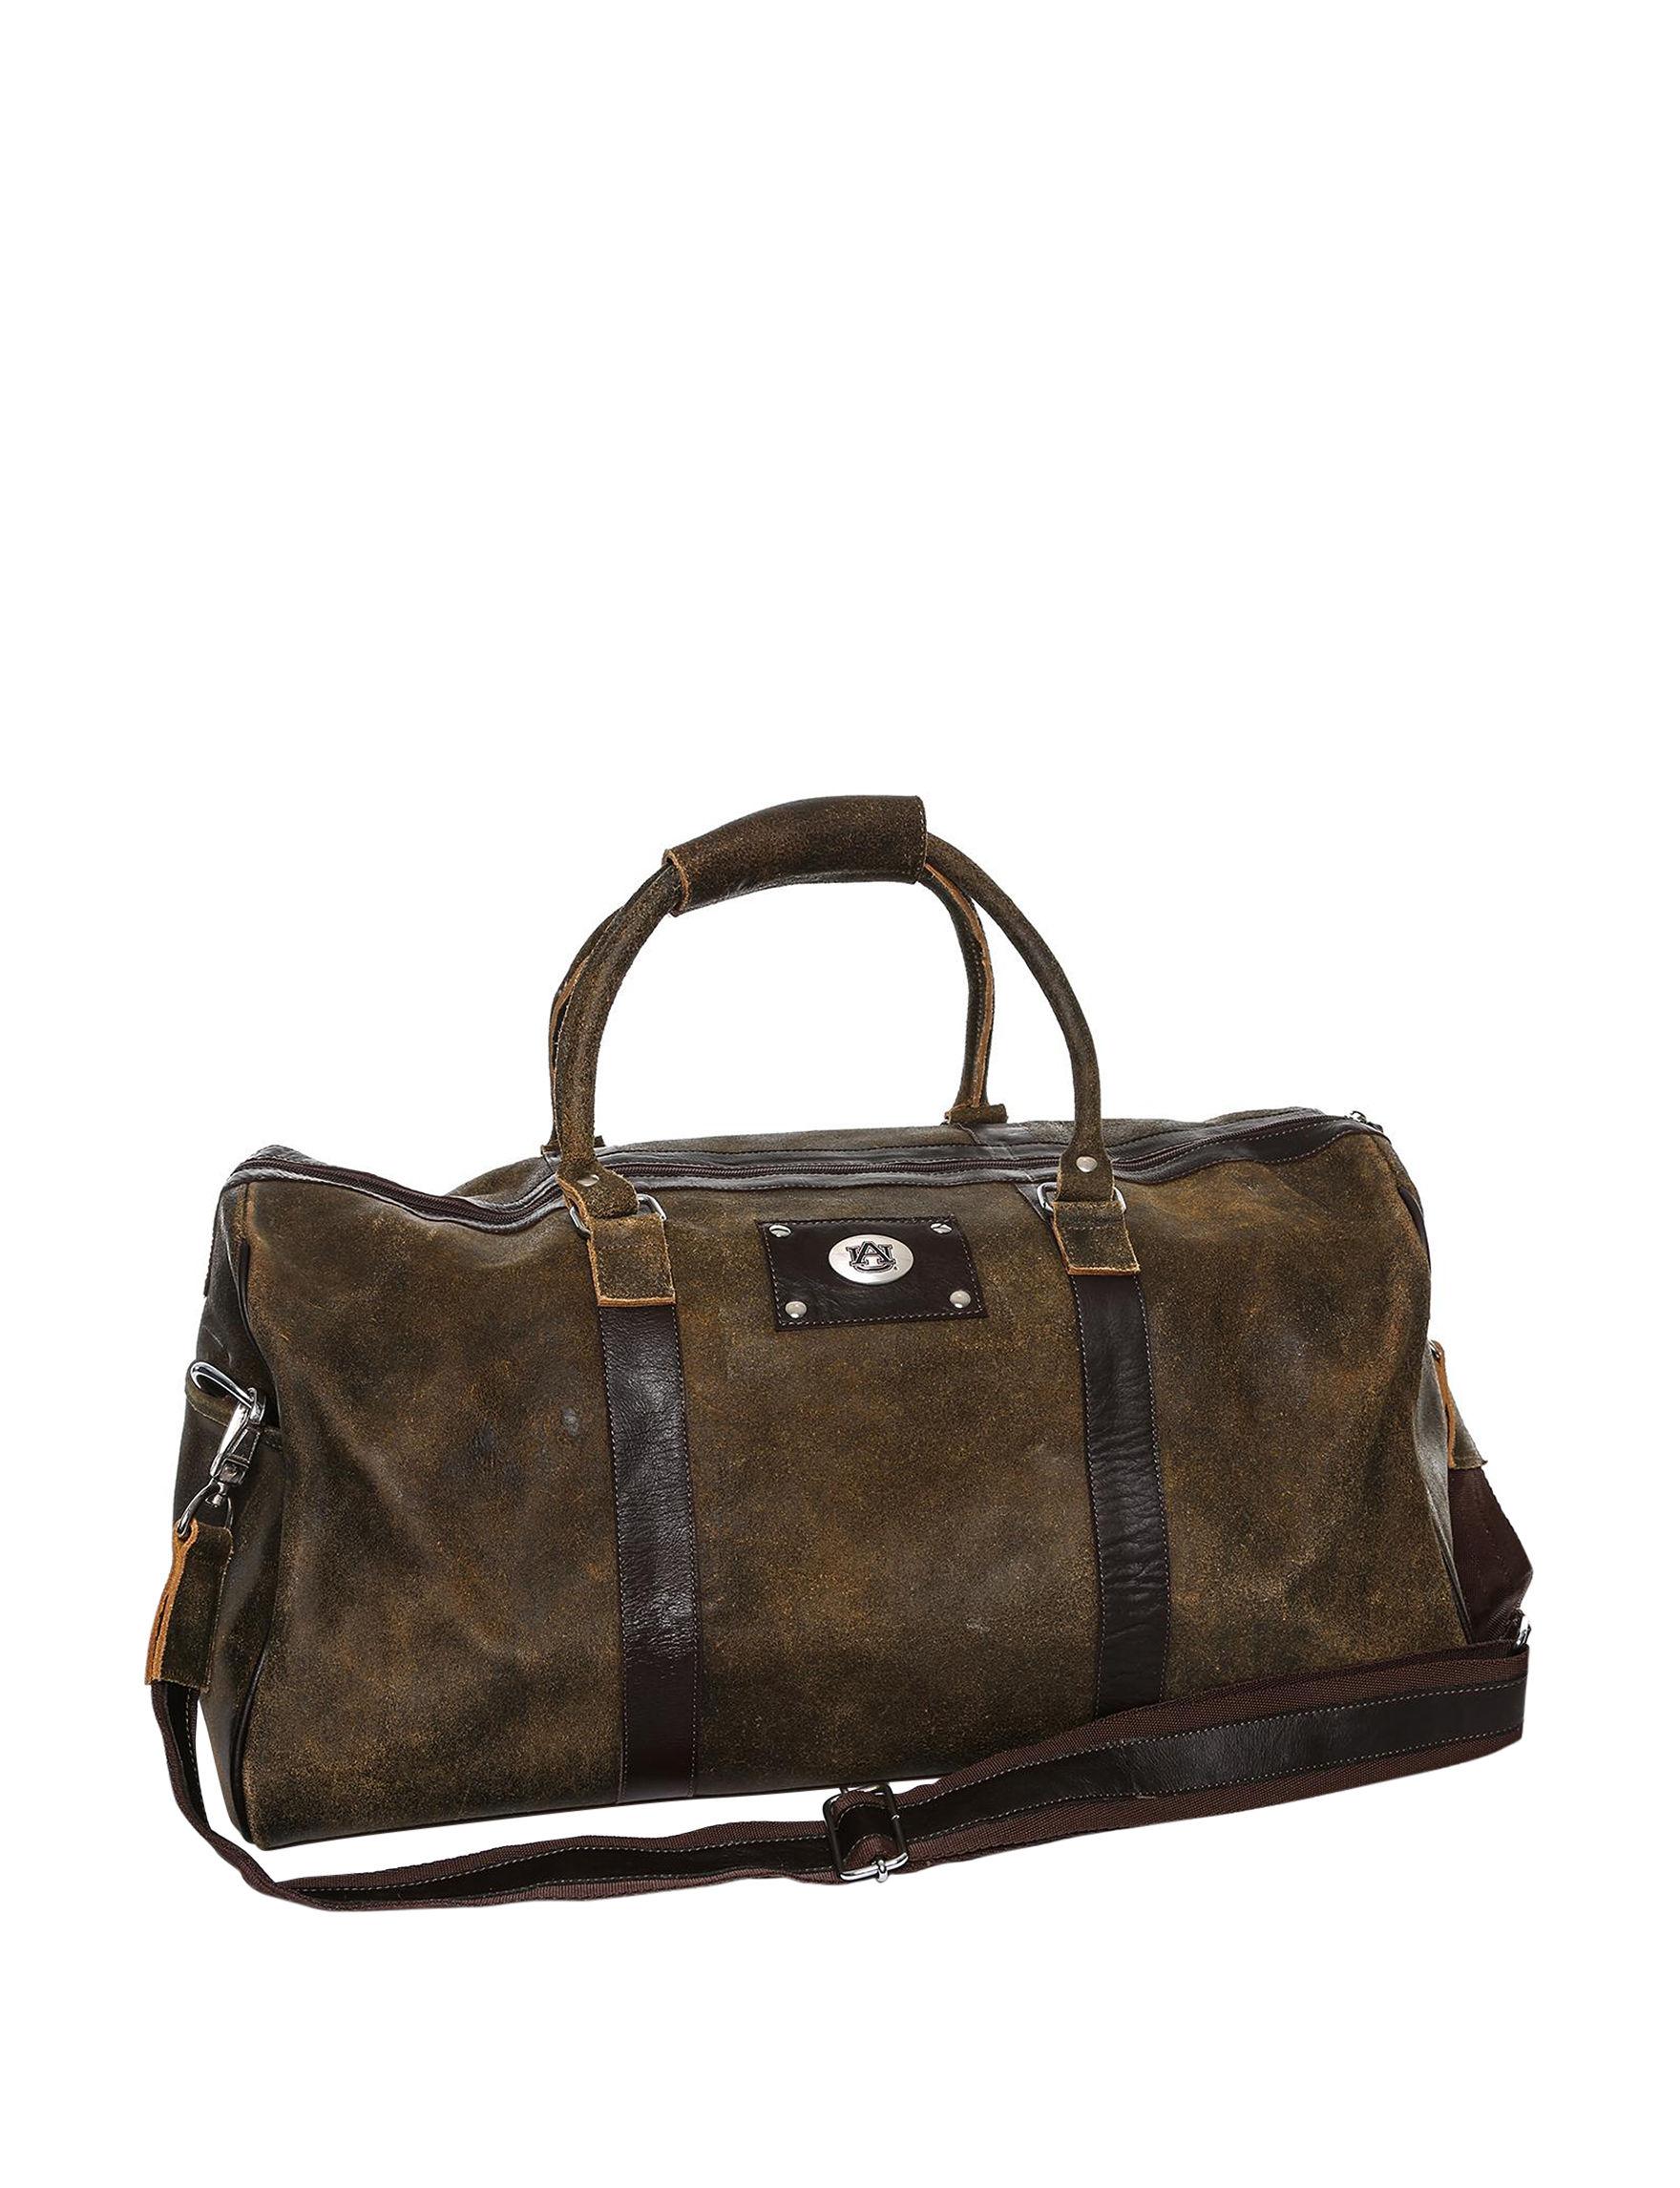 6aa6e4c758 Auburn University Tigers Premium Weekender Duffle Bag